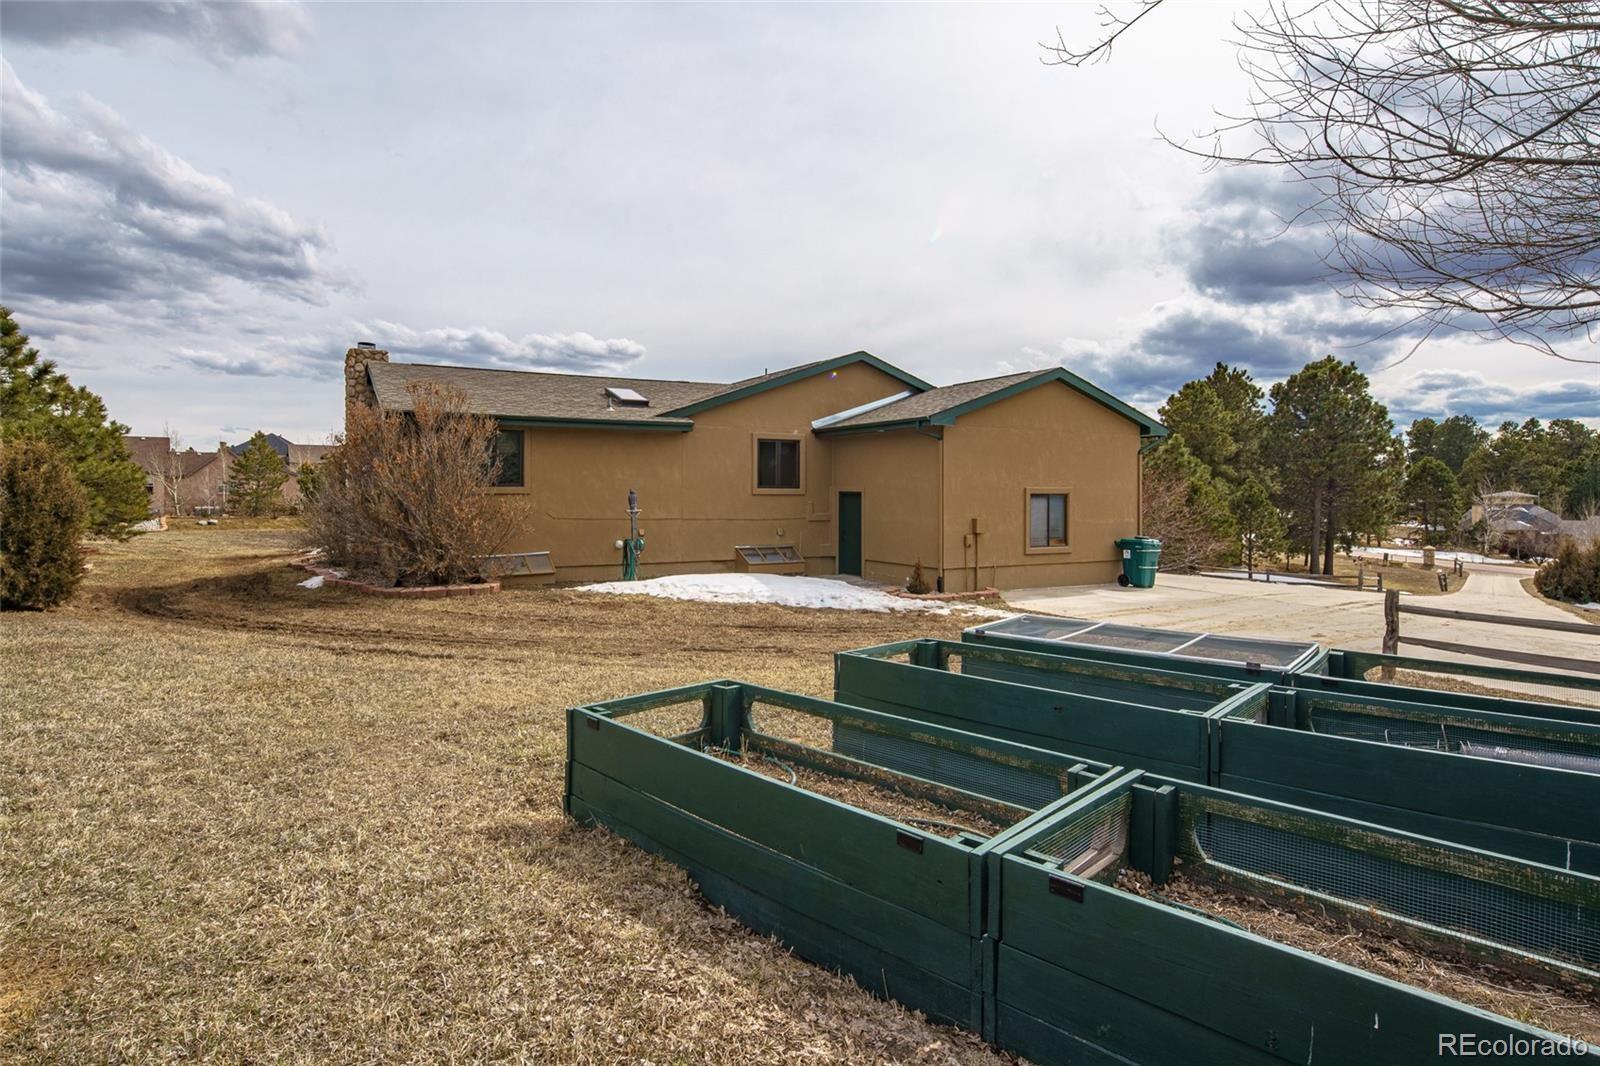 MLS# 9205685 - 19 - 17720 Pioneer Crossing, Colorado Springs, CO 80908